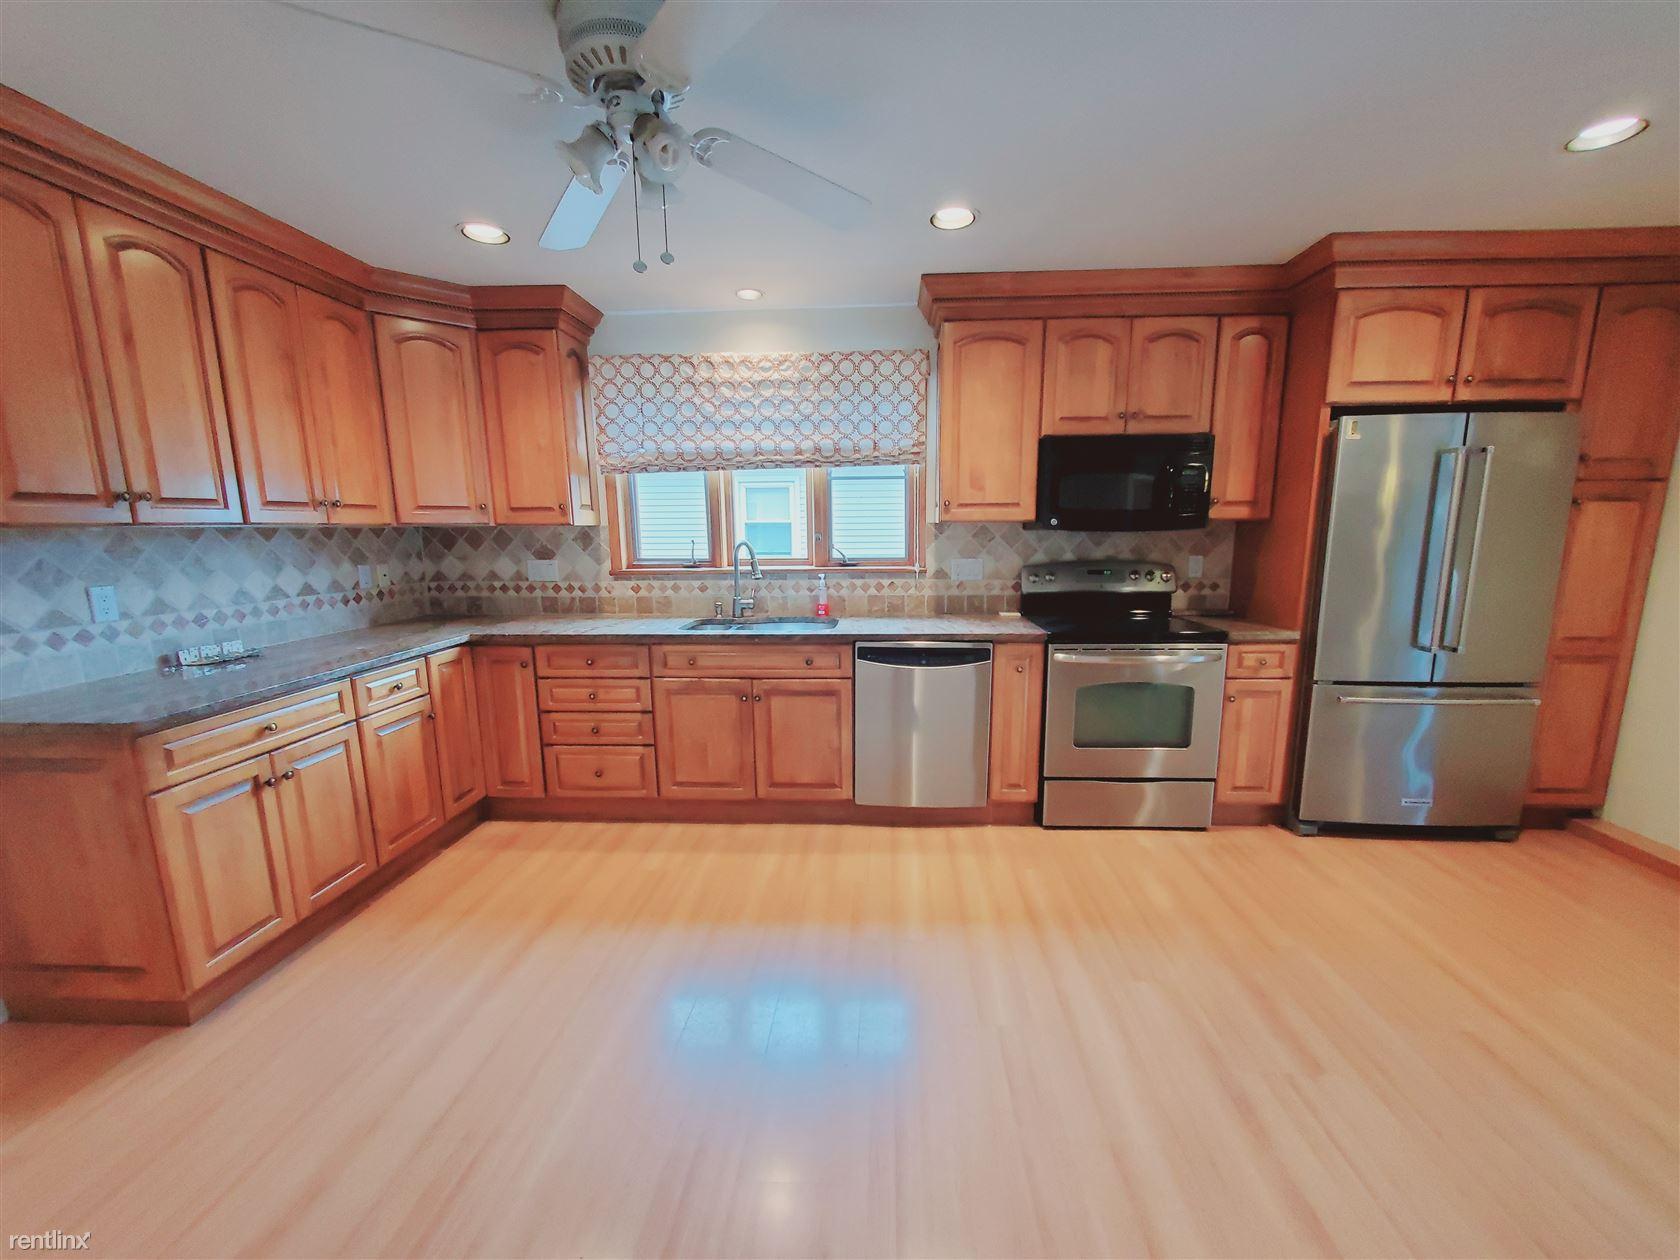 1003 Shippan Ave, Stamford, CT - 2,900 USD/ month